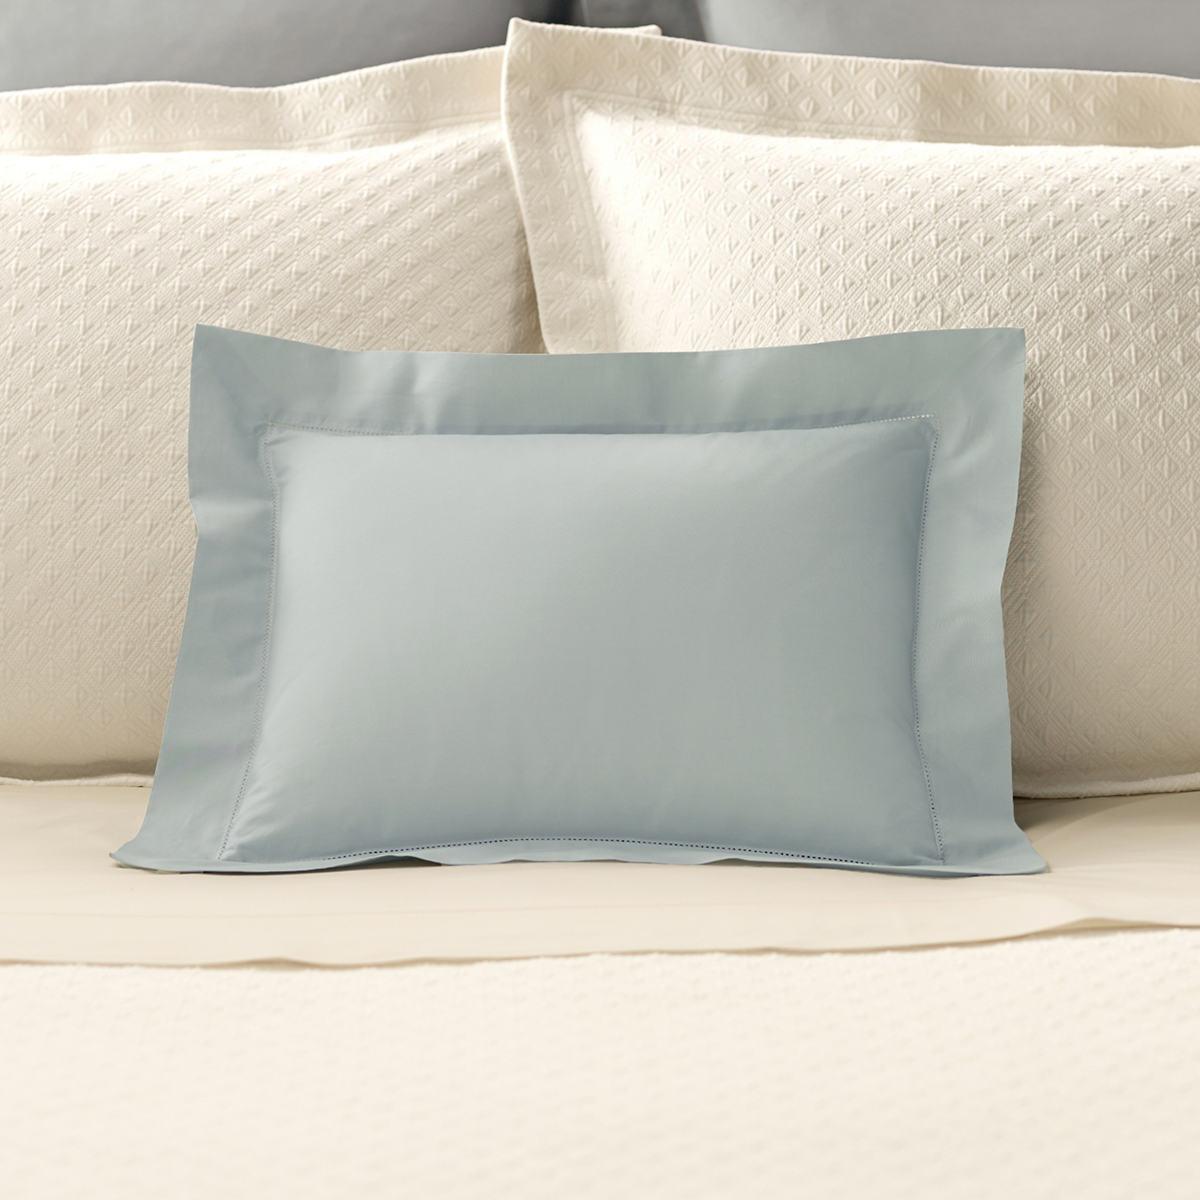 Lia Oceano Decorative Pillow